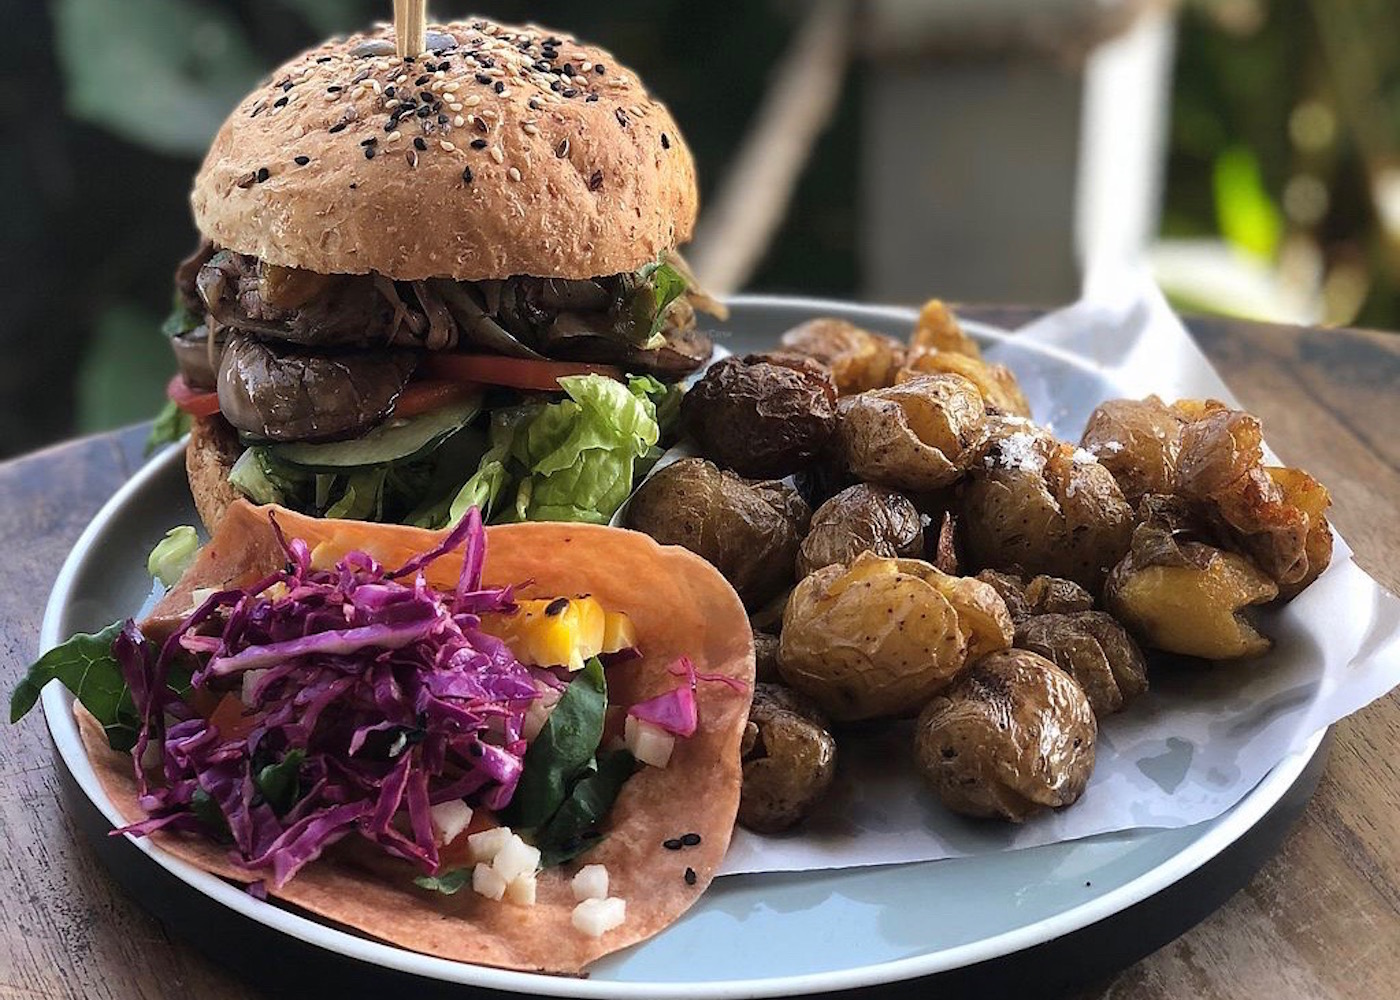 Vegetarian burger at The Shady Shack restaurant in Canggu, Bali, Indonesia